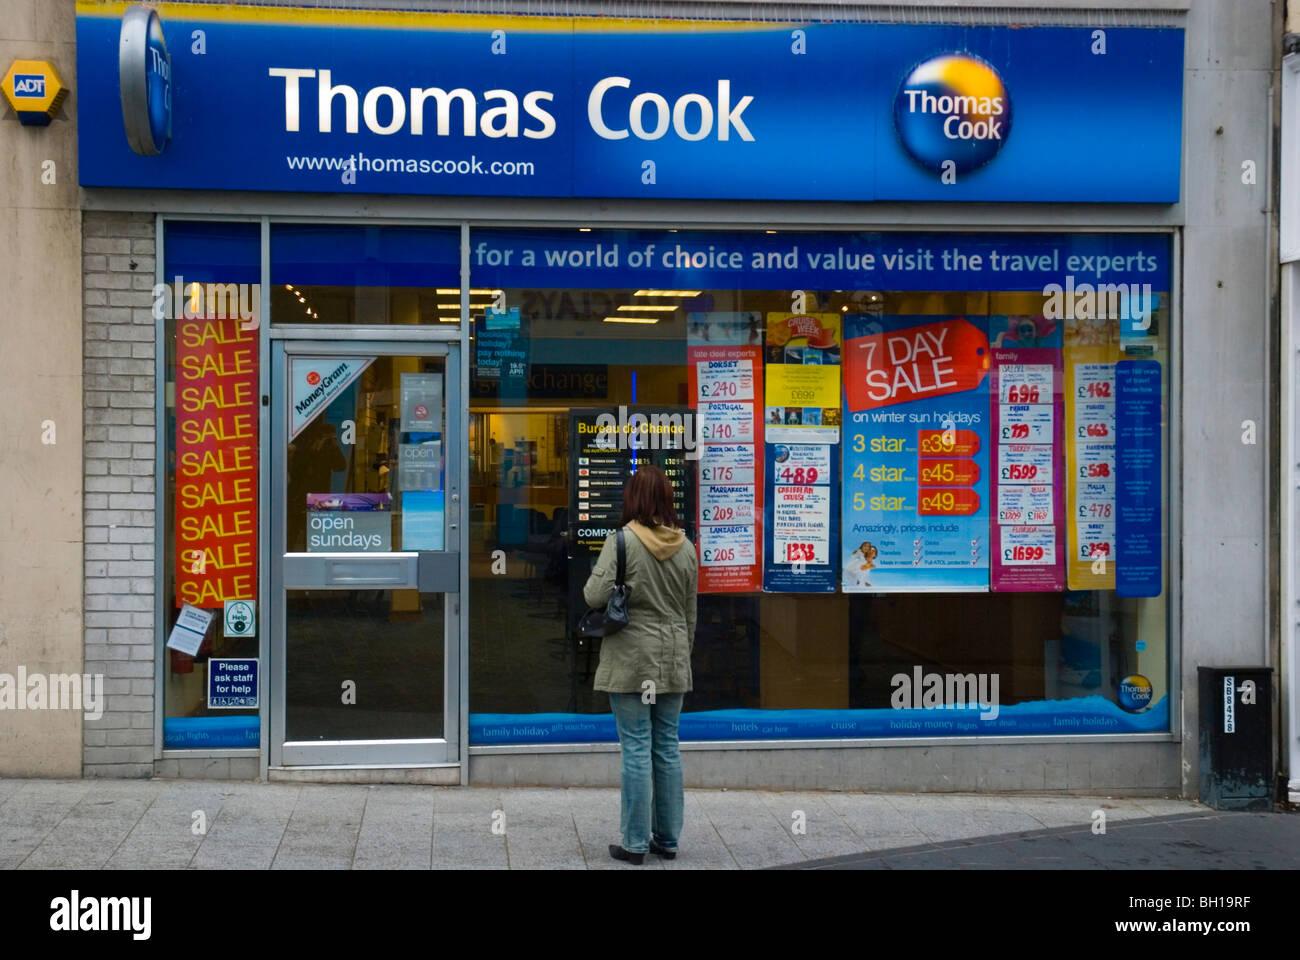 Thomas Cook travel agency Liverpool One shopping area Liverpool Merseyside England UK Europe - Stock Image